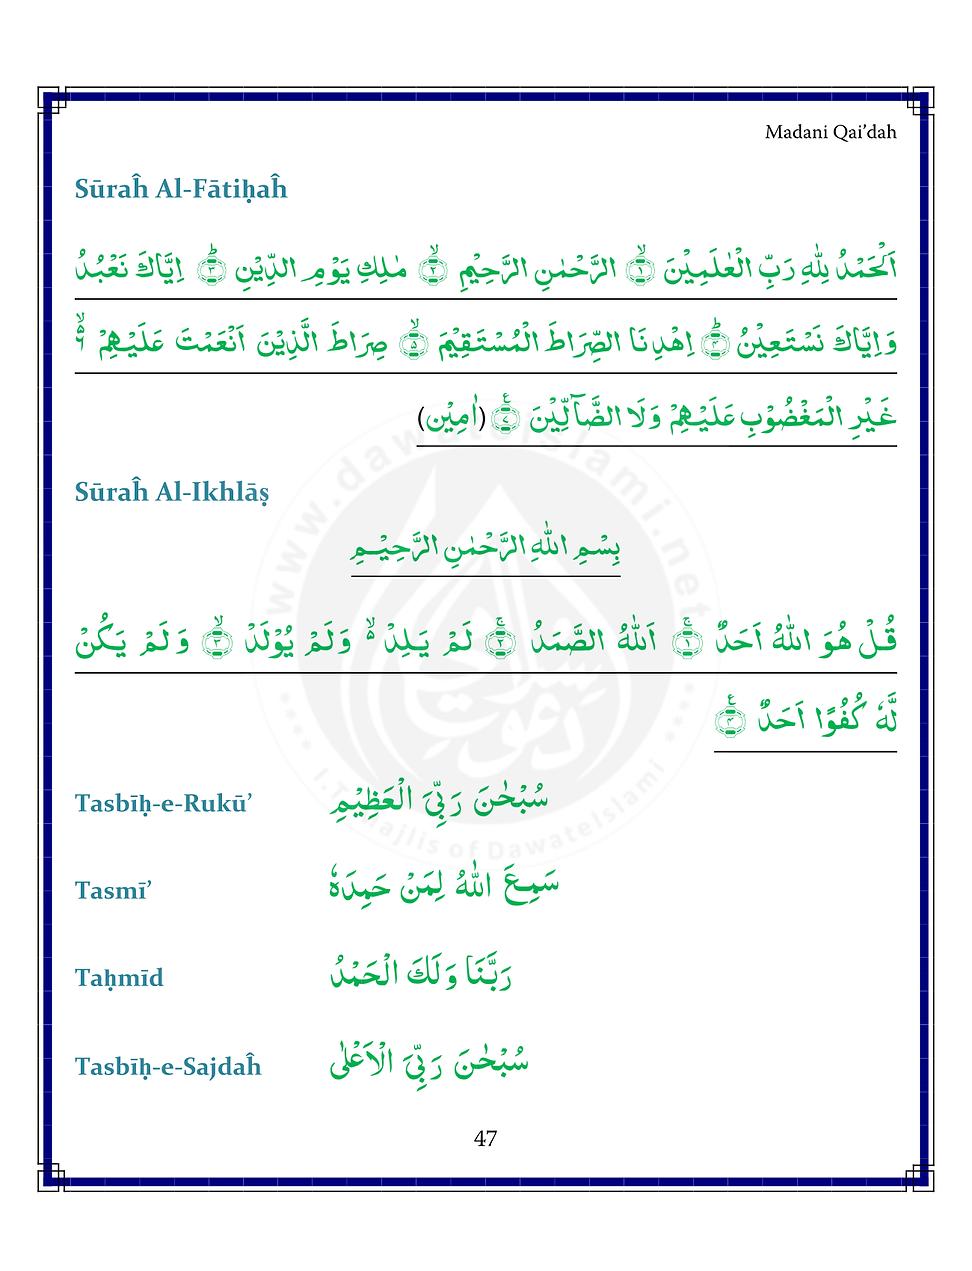 Madani Qaidah-57.png